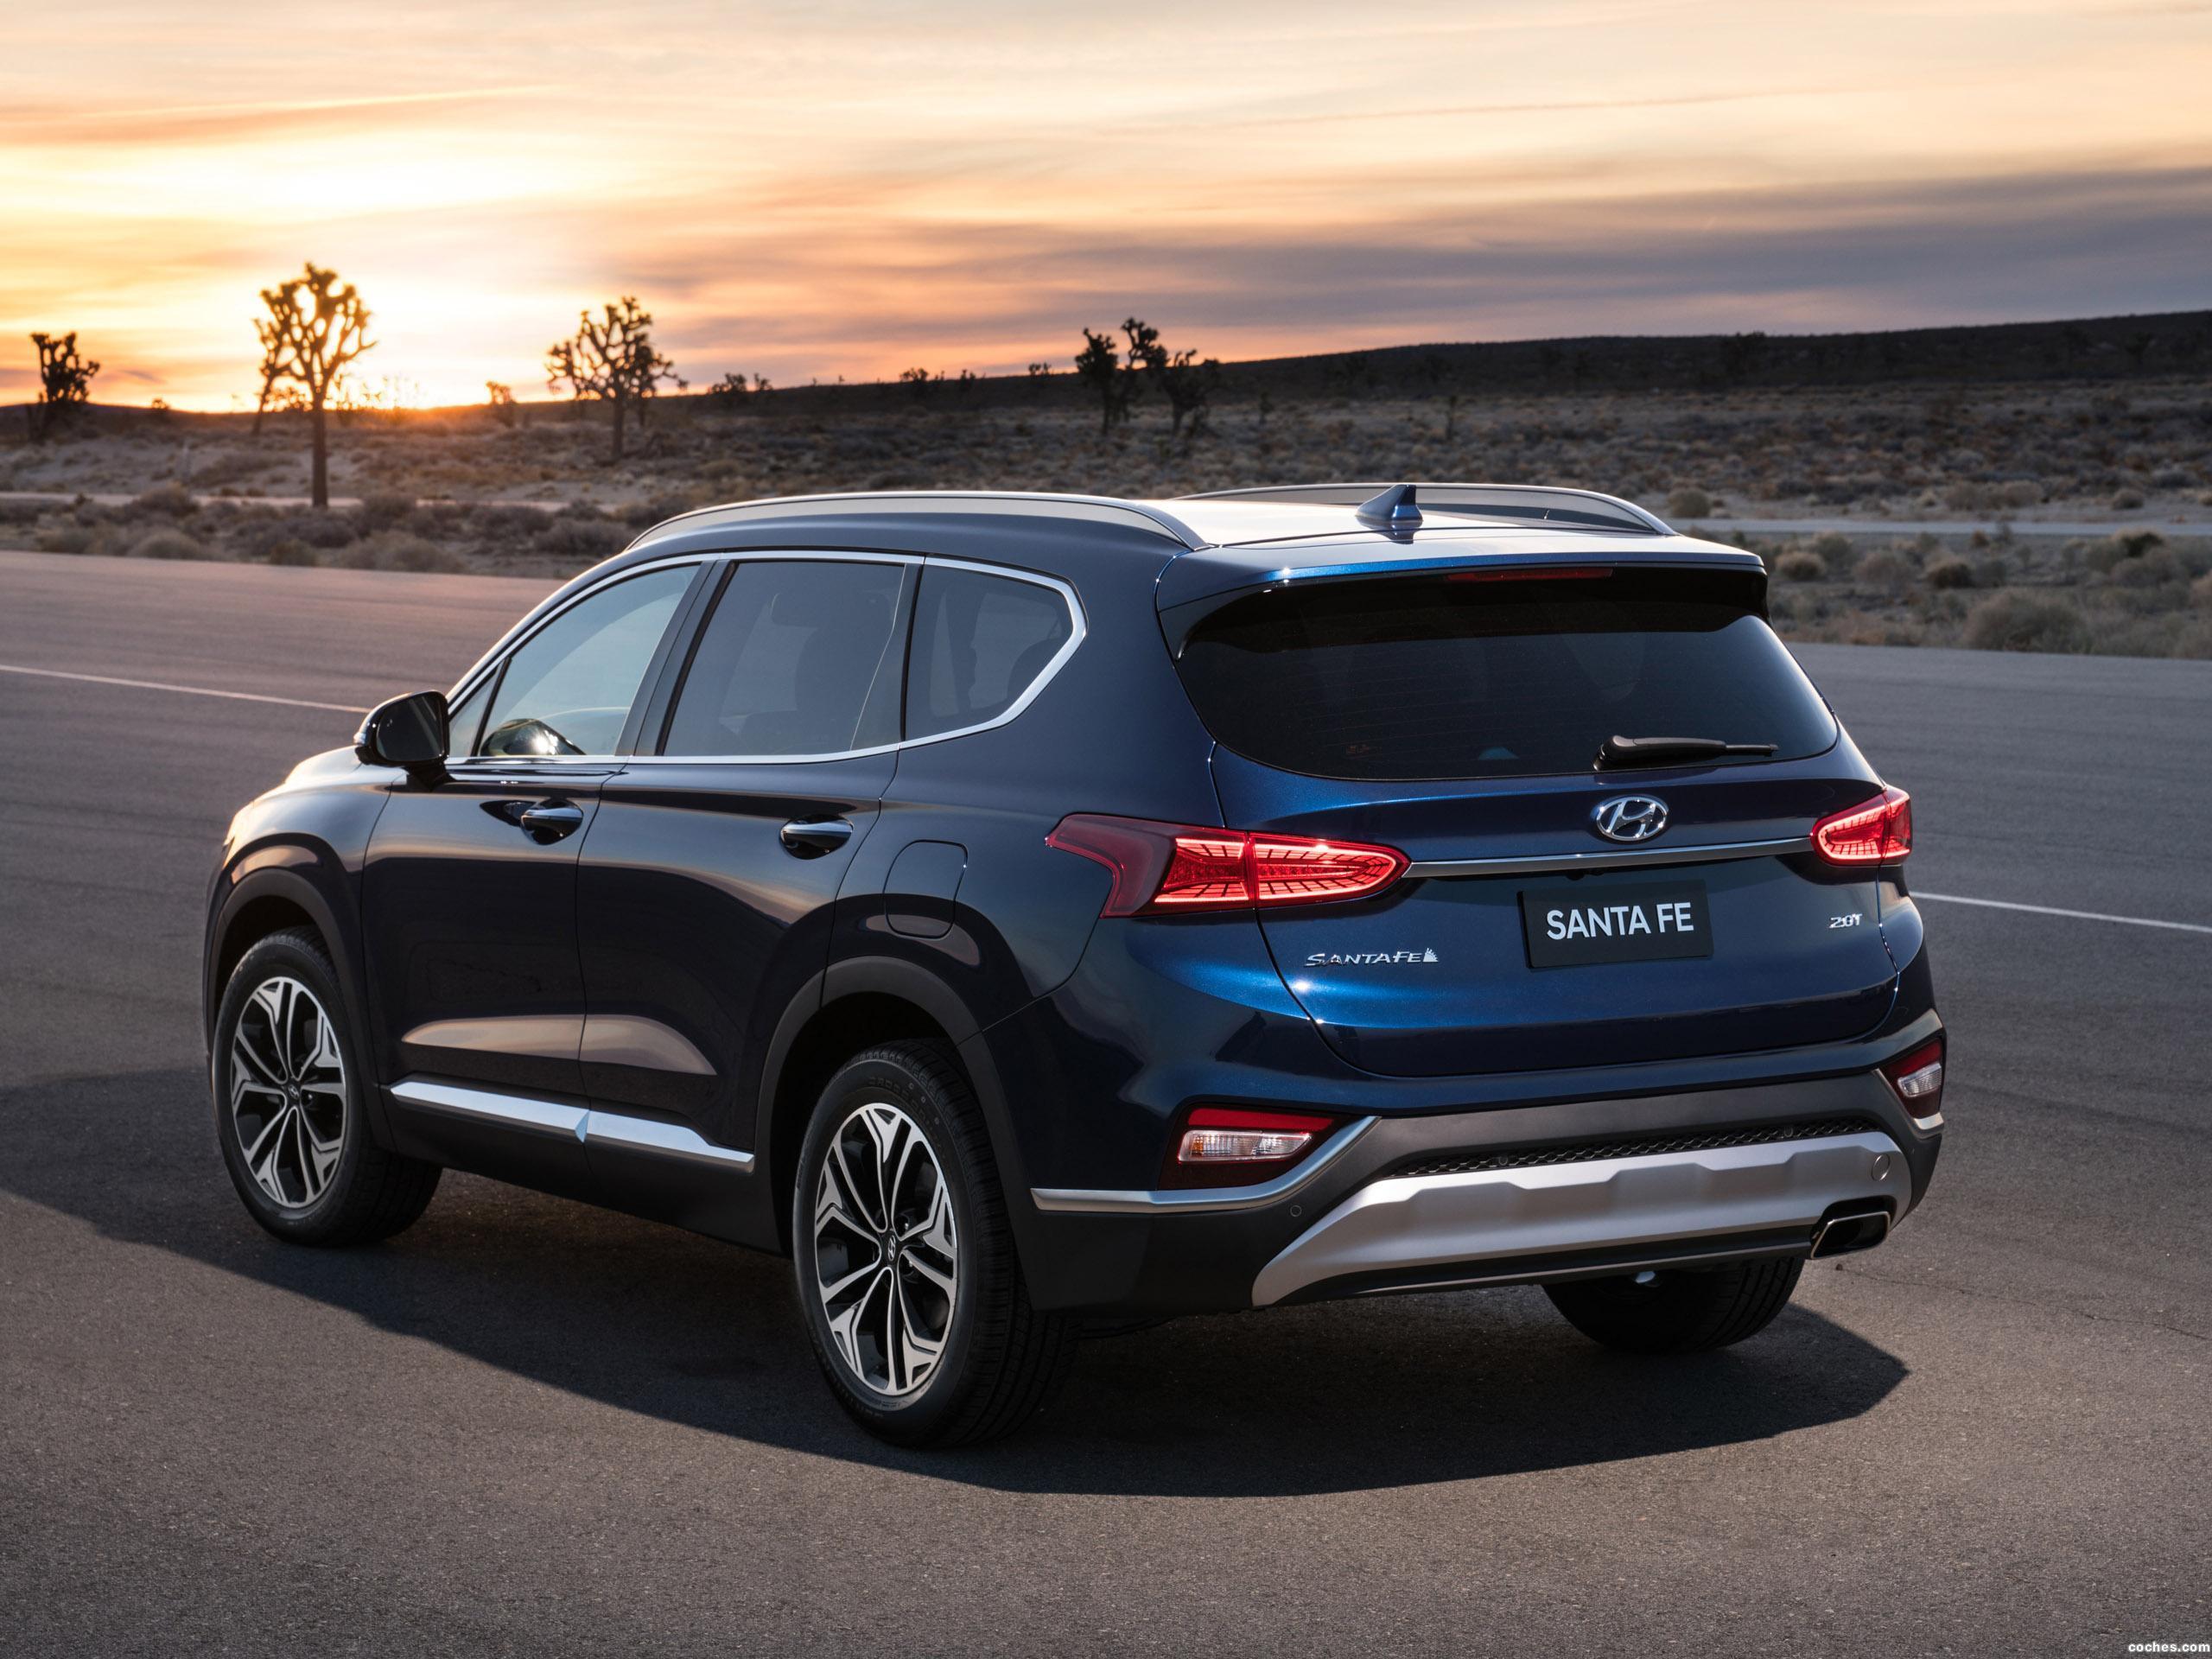 Foto 2 de Hyundai Santa Fe USA 2018